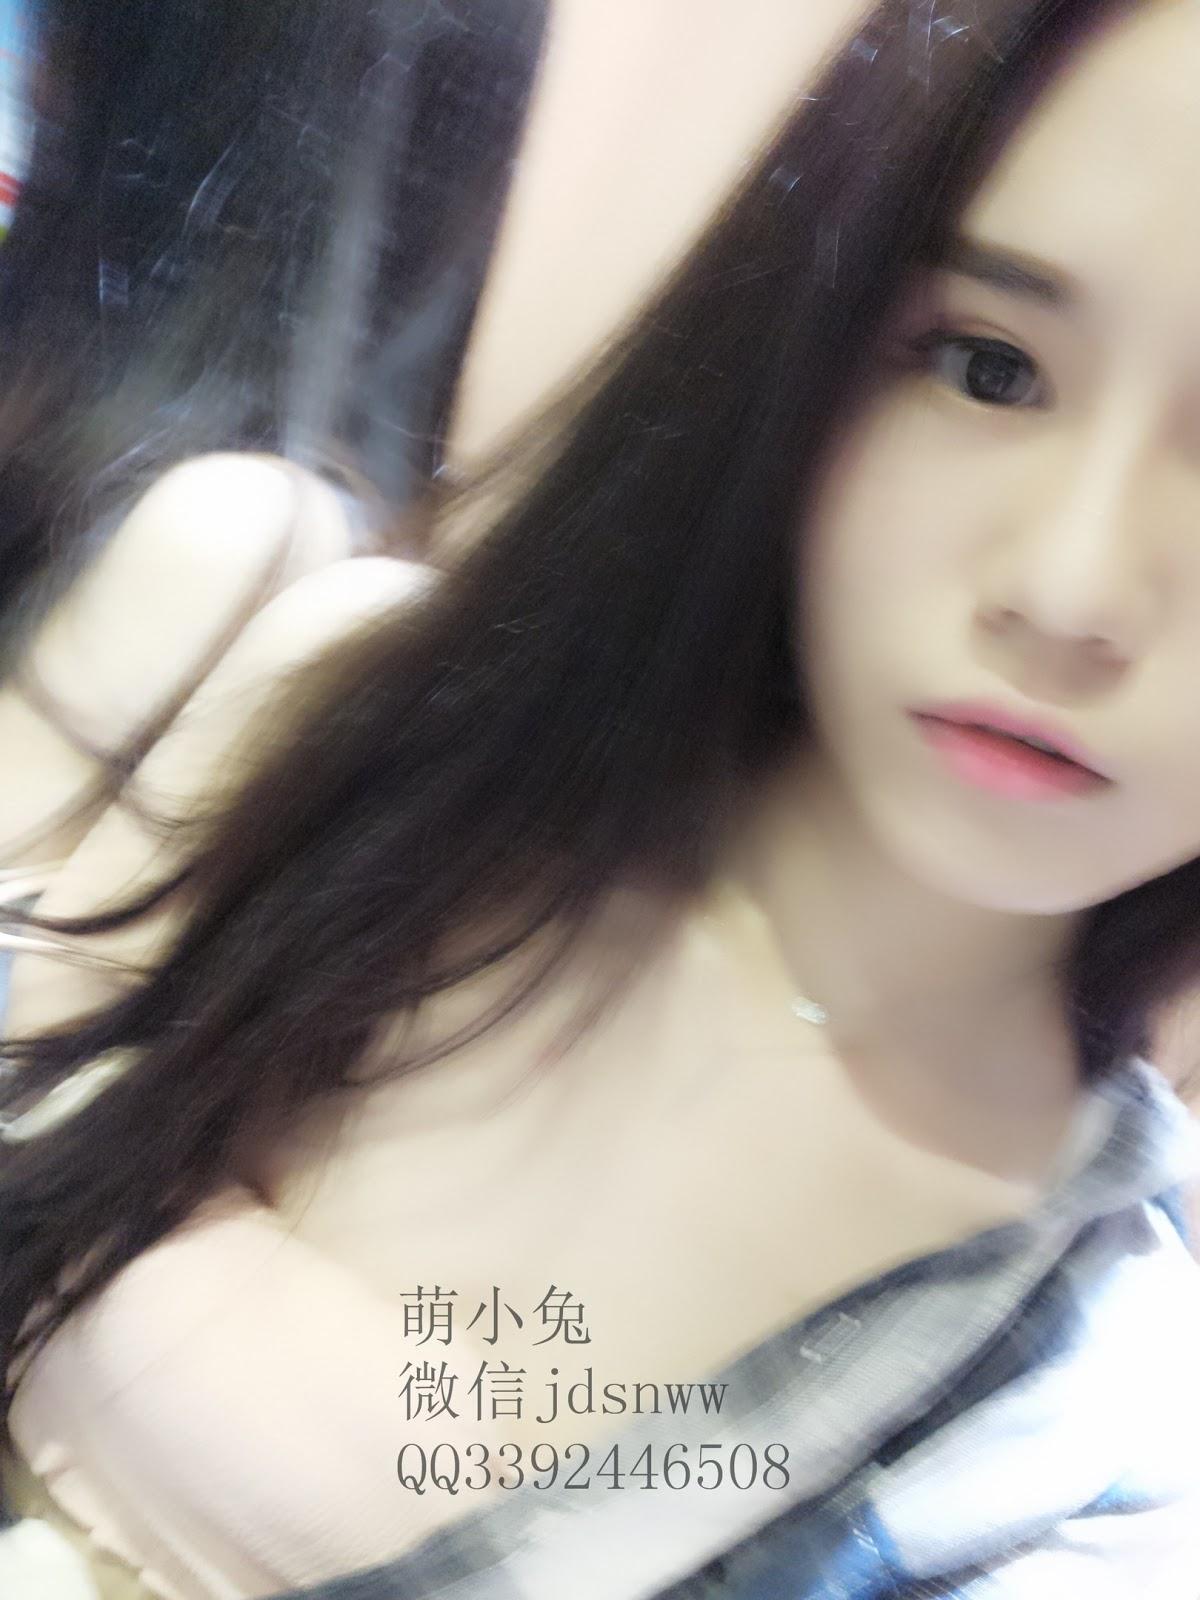 qtButaYho8c - Cute chinese girl selfie hot show tits n pussy 2020